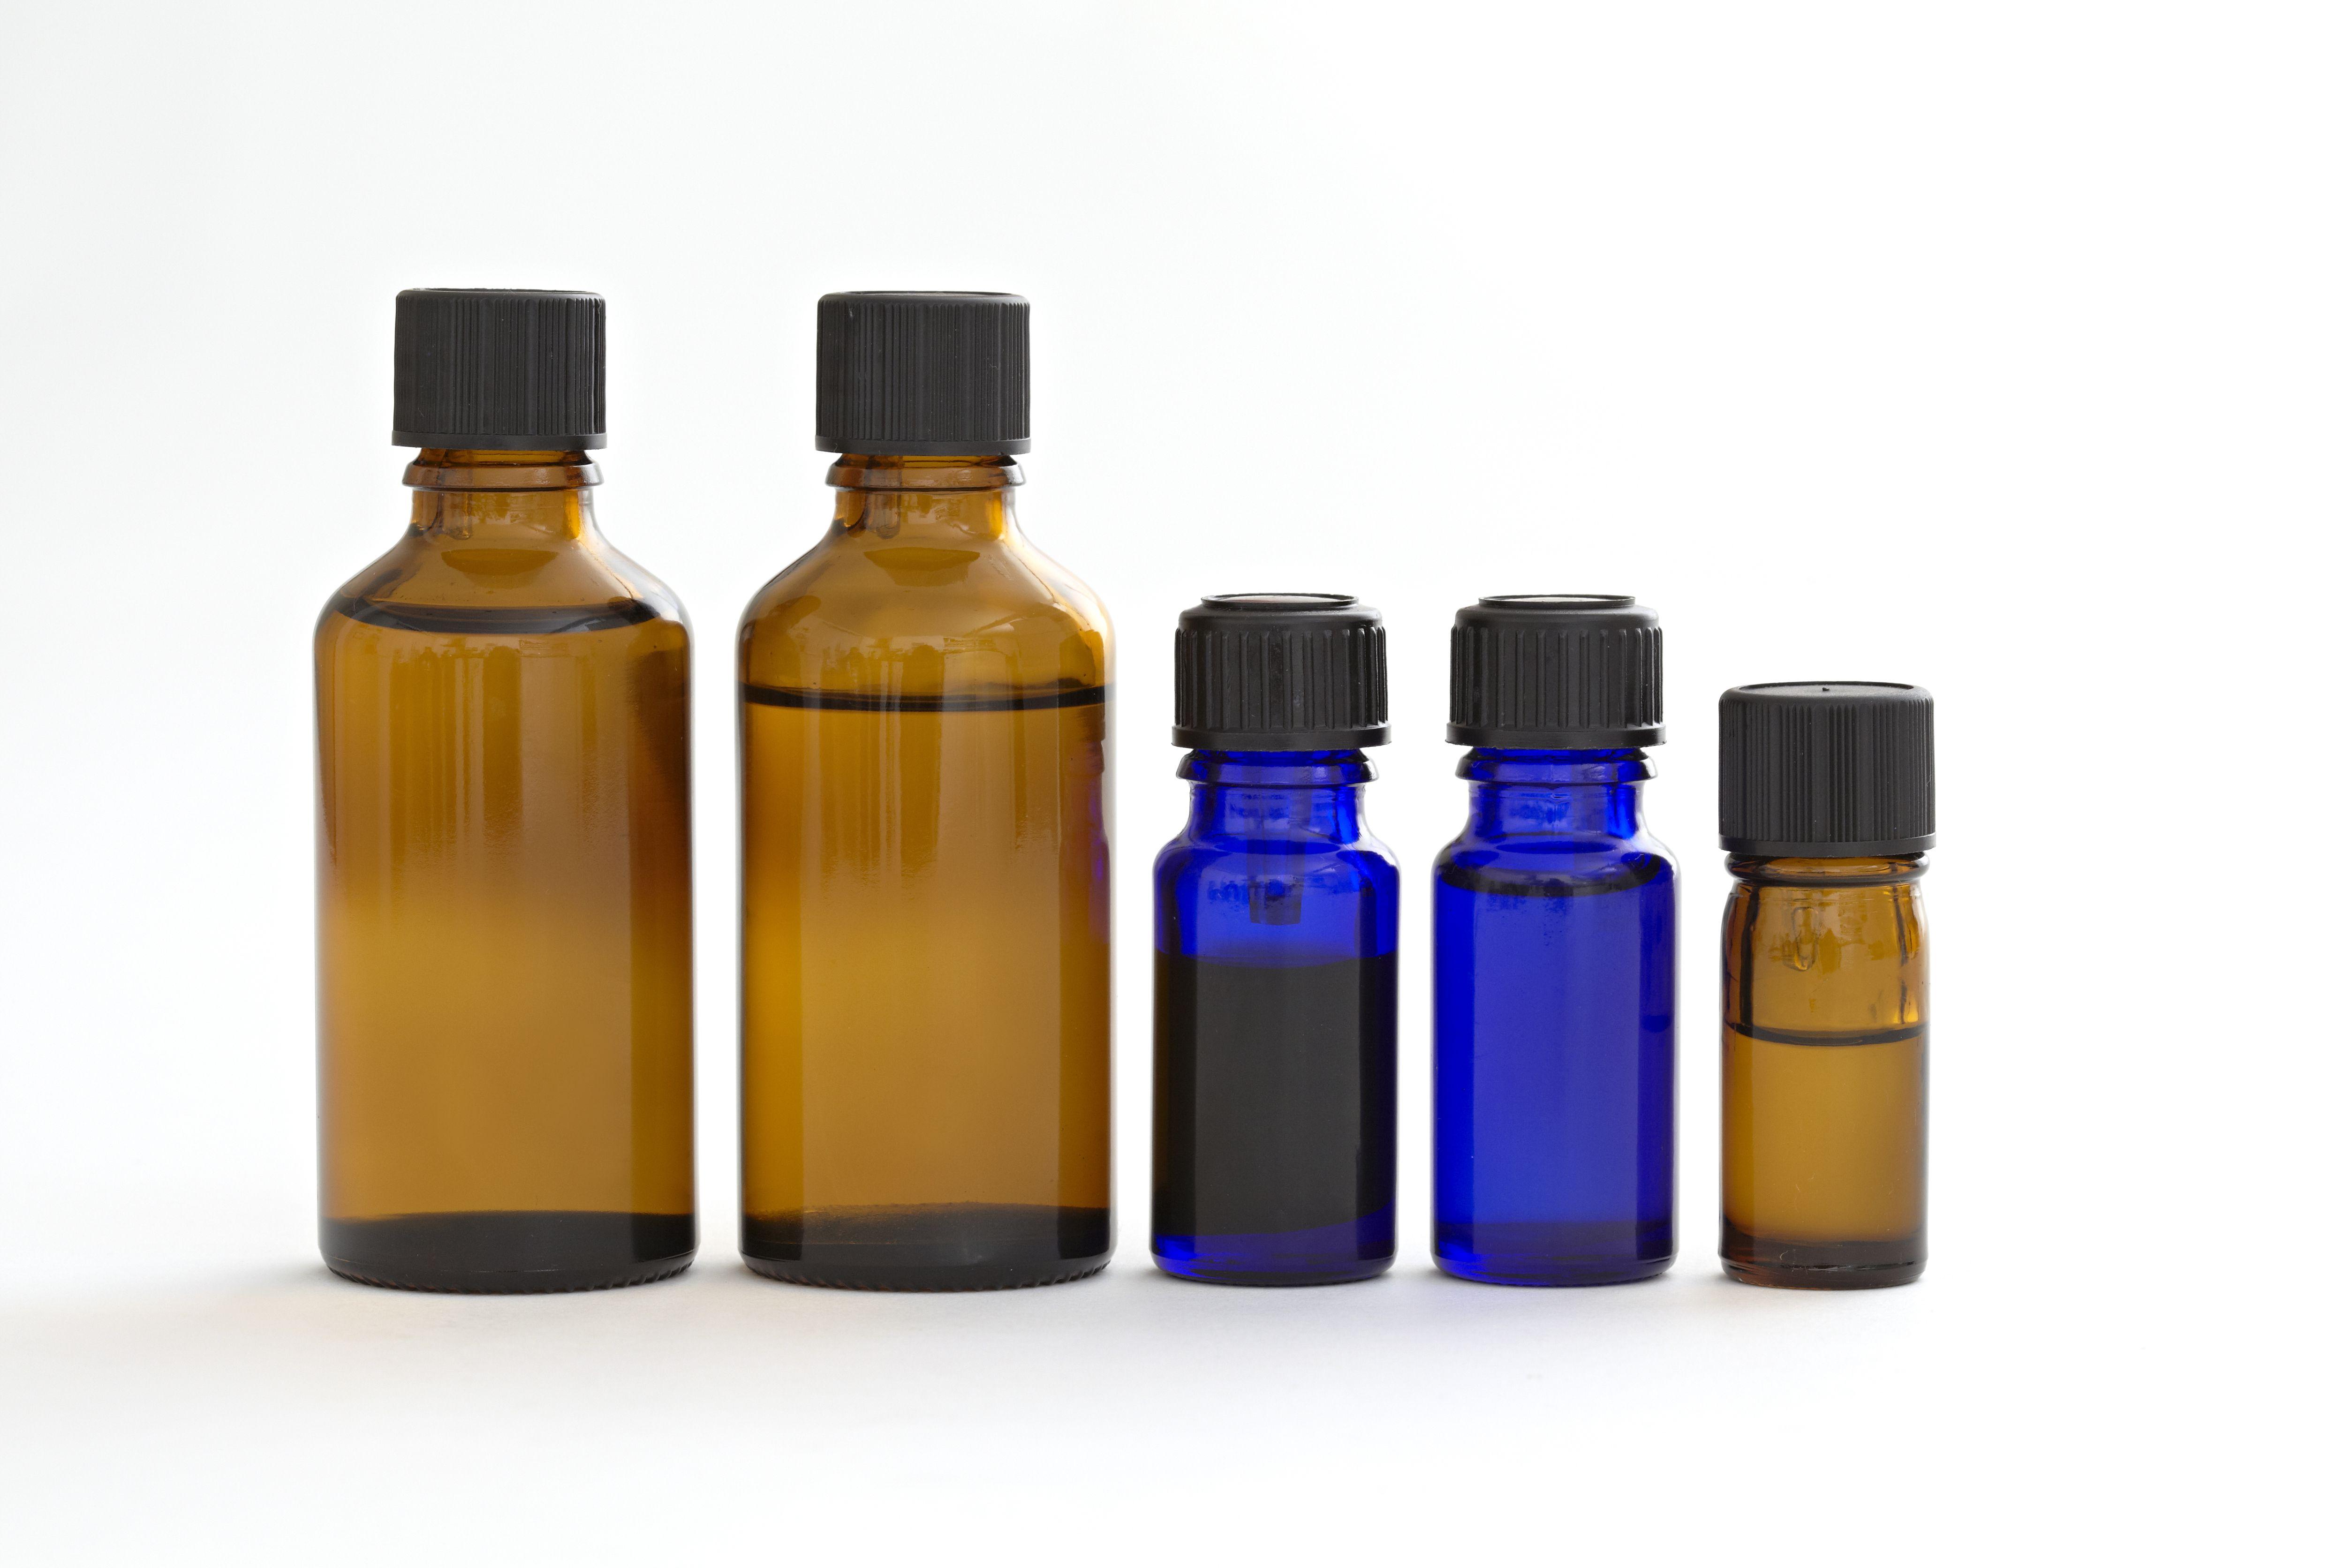 Essential oils in glass bottles